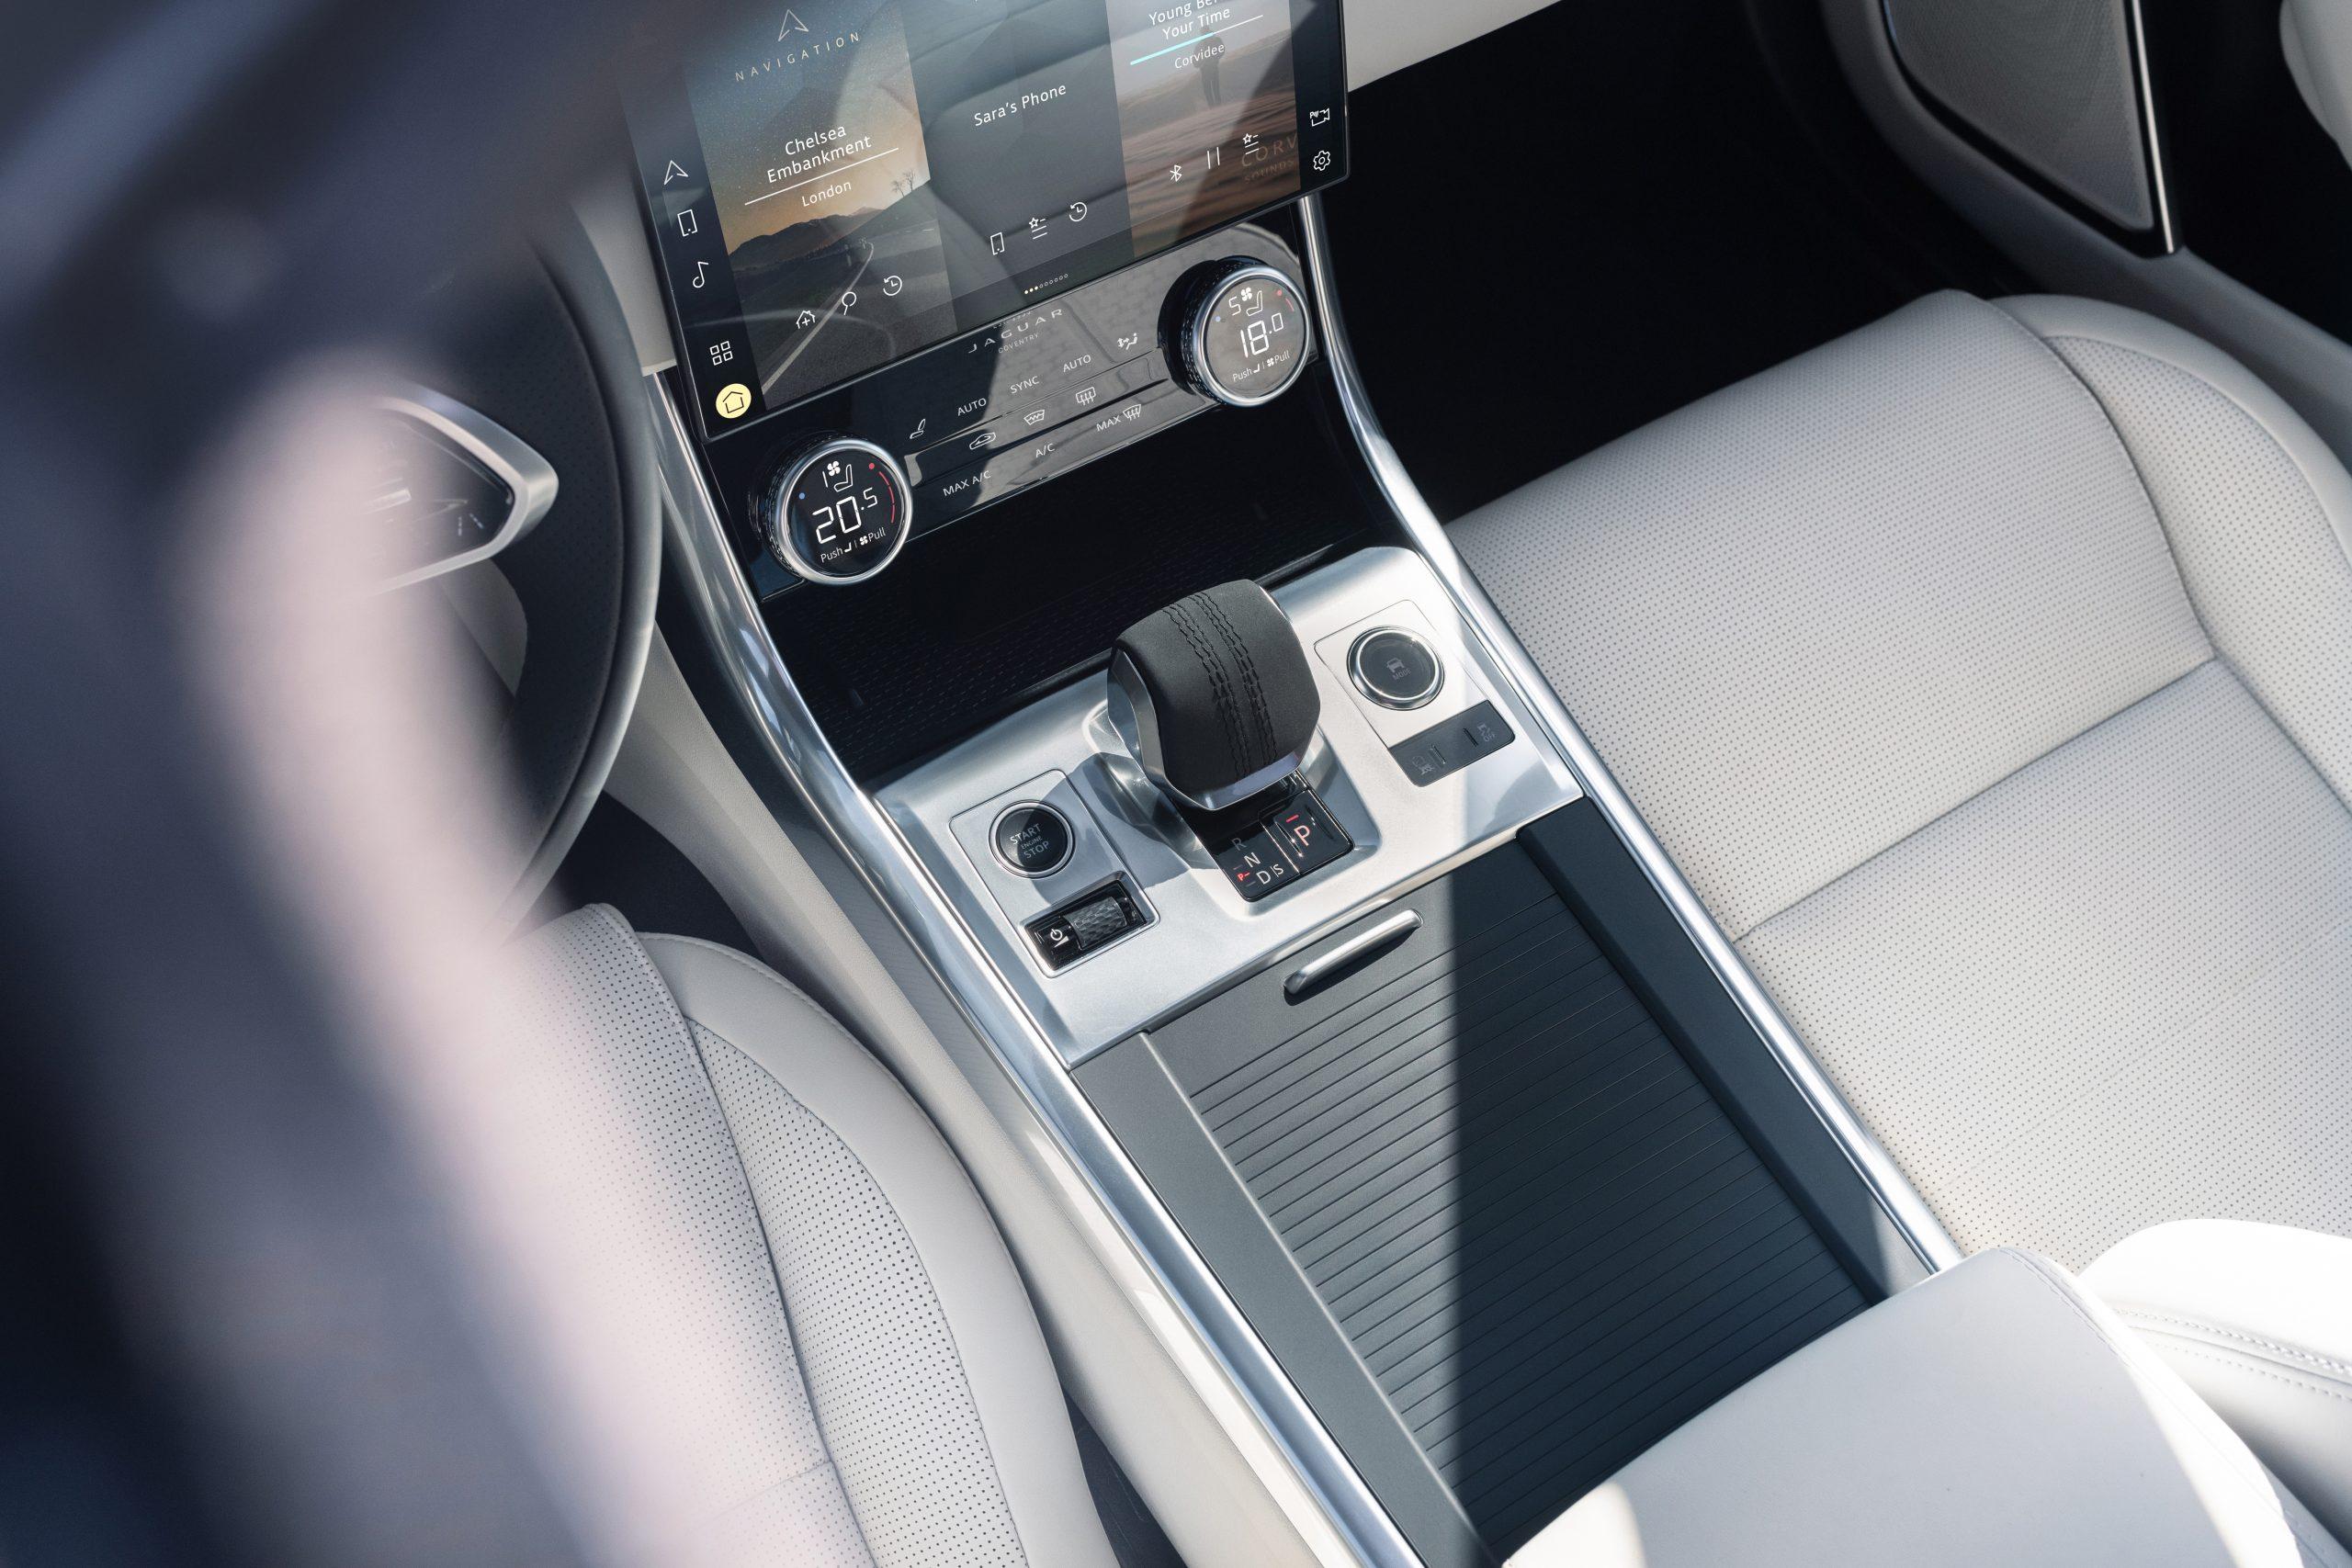 202021 Jaguar XF interior center console